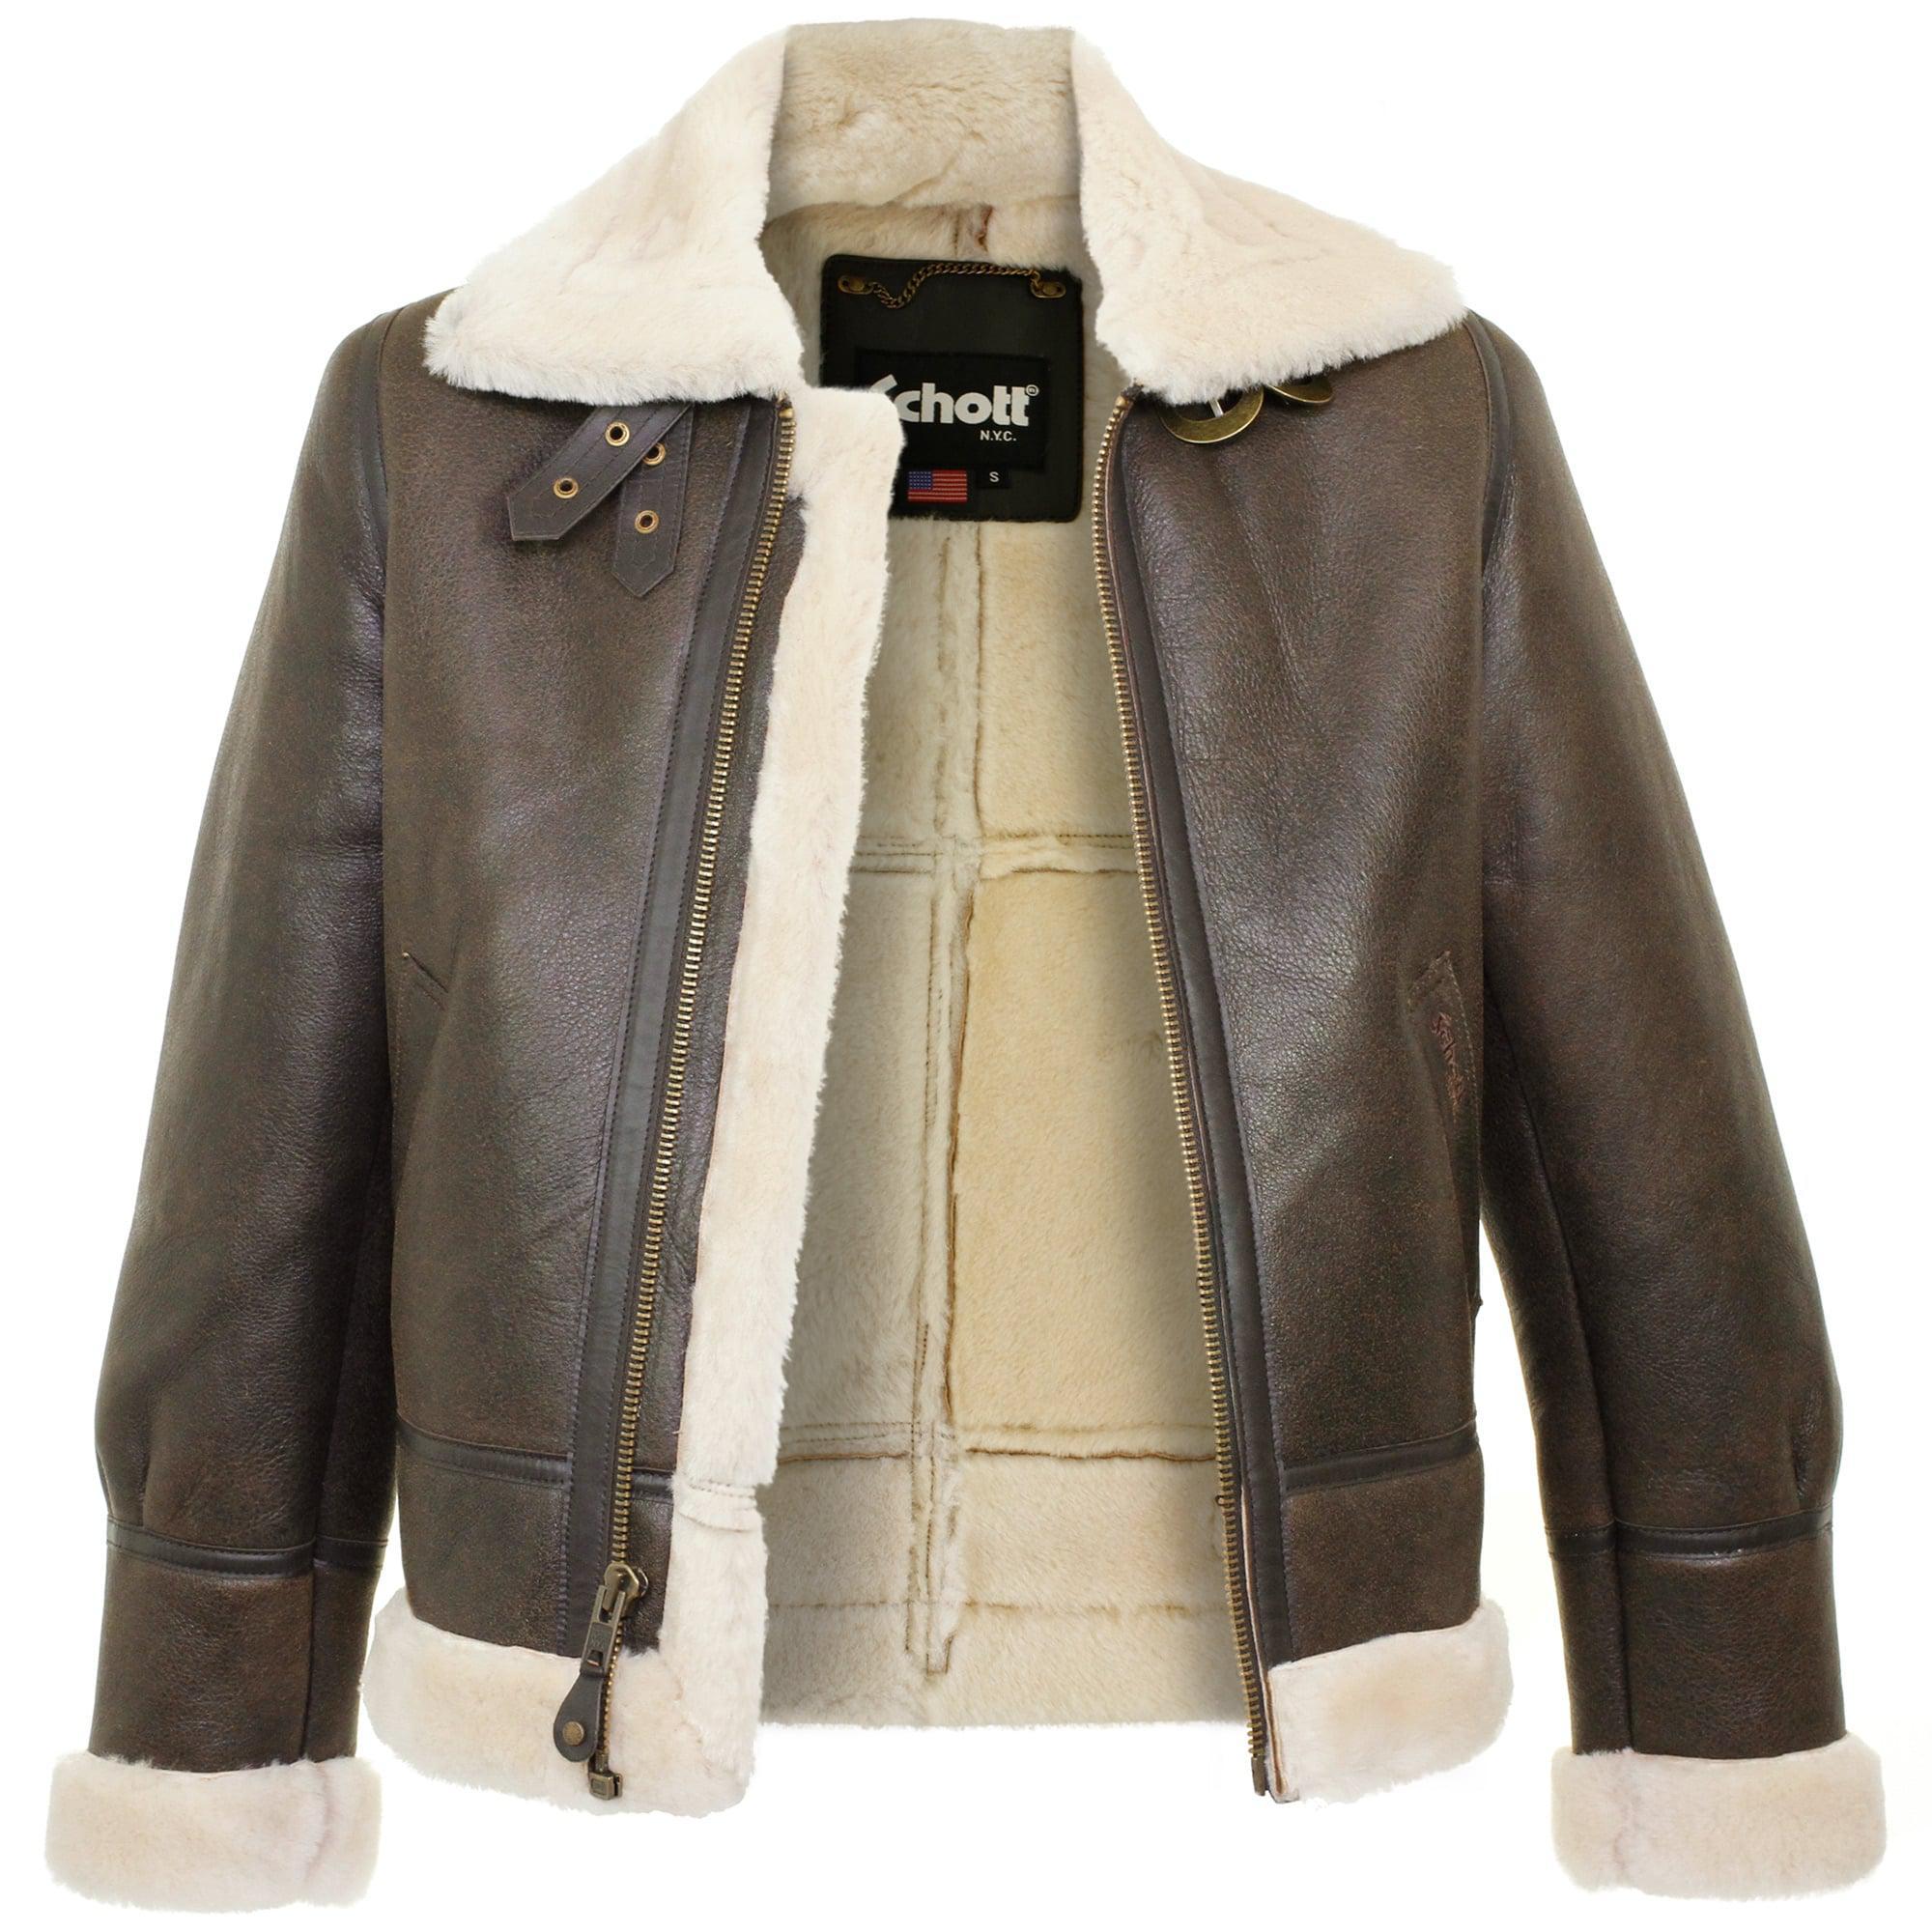 c7c55b1ab Schott Nyc Multicolor Schott Lc1259 Bombardier Marron Sheepskin Leather  Jacket for men